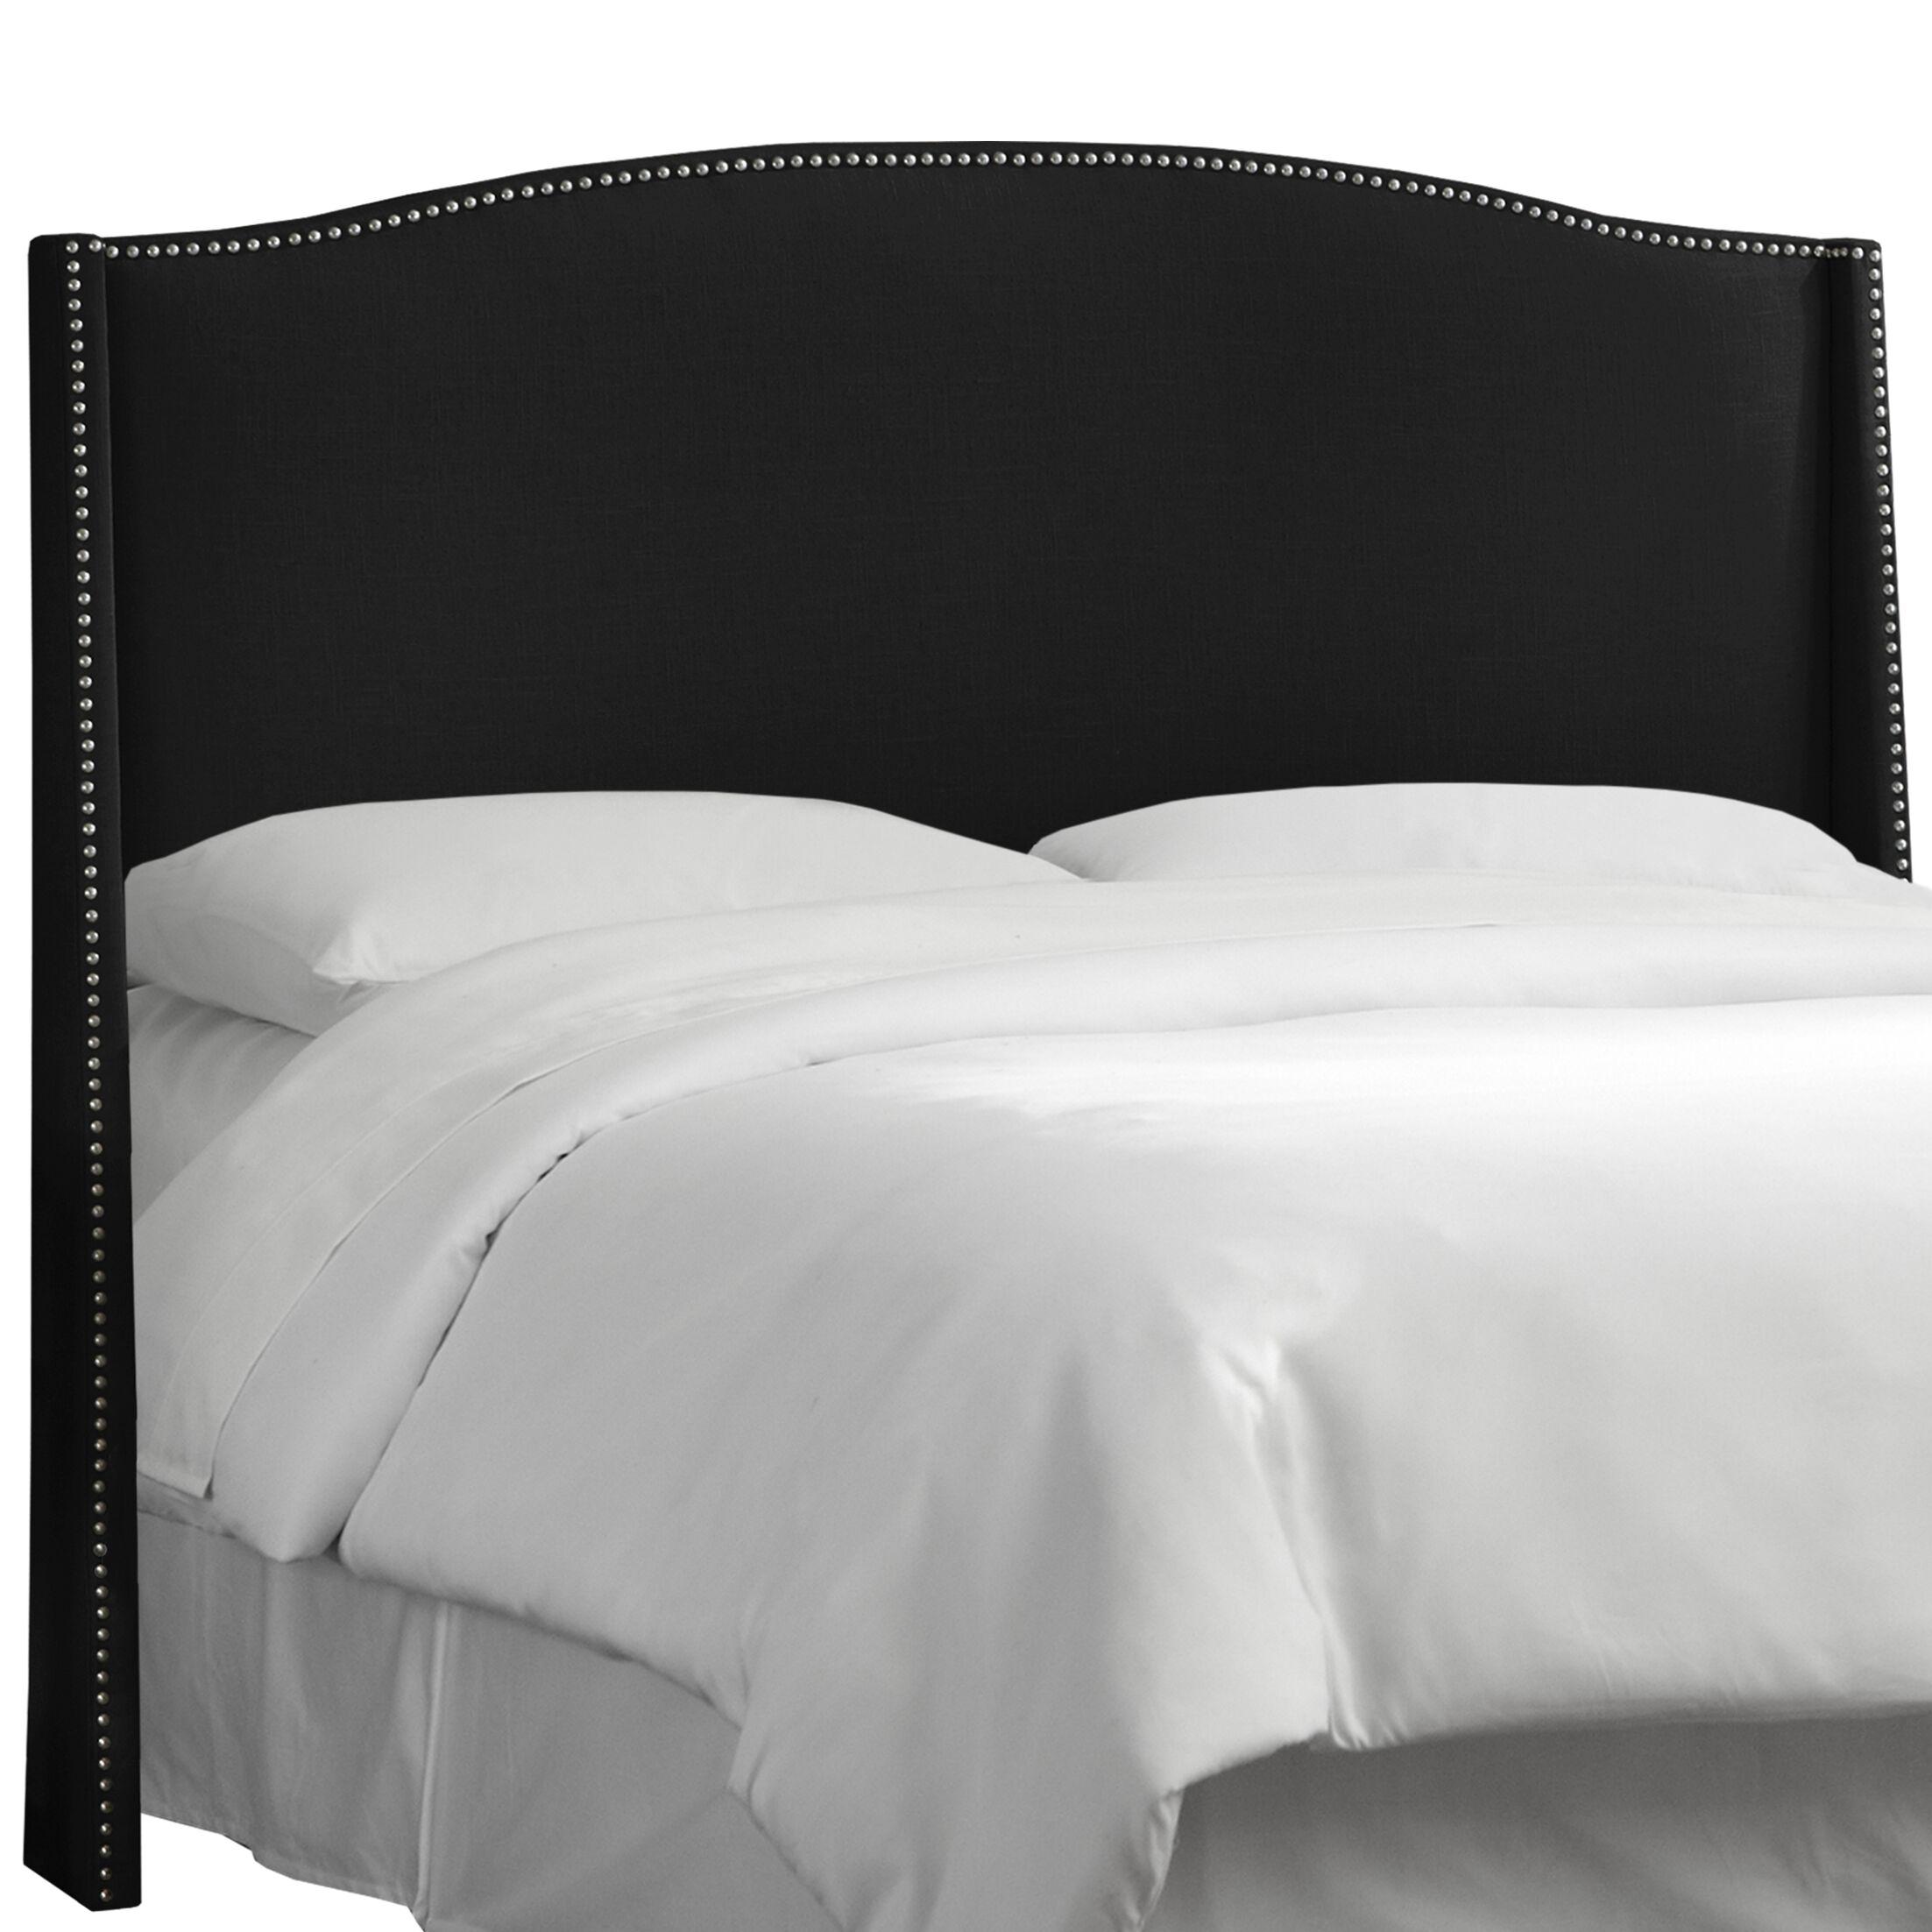 Deanery Linen Nail Button Upholstered Wingback Headboard Upholstery: Linen Black, Size: California King